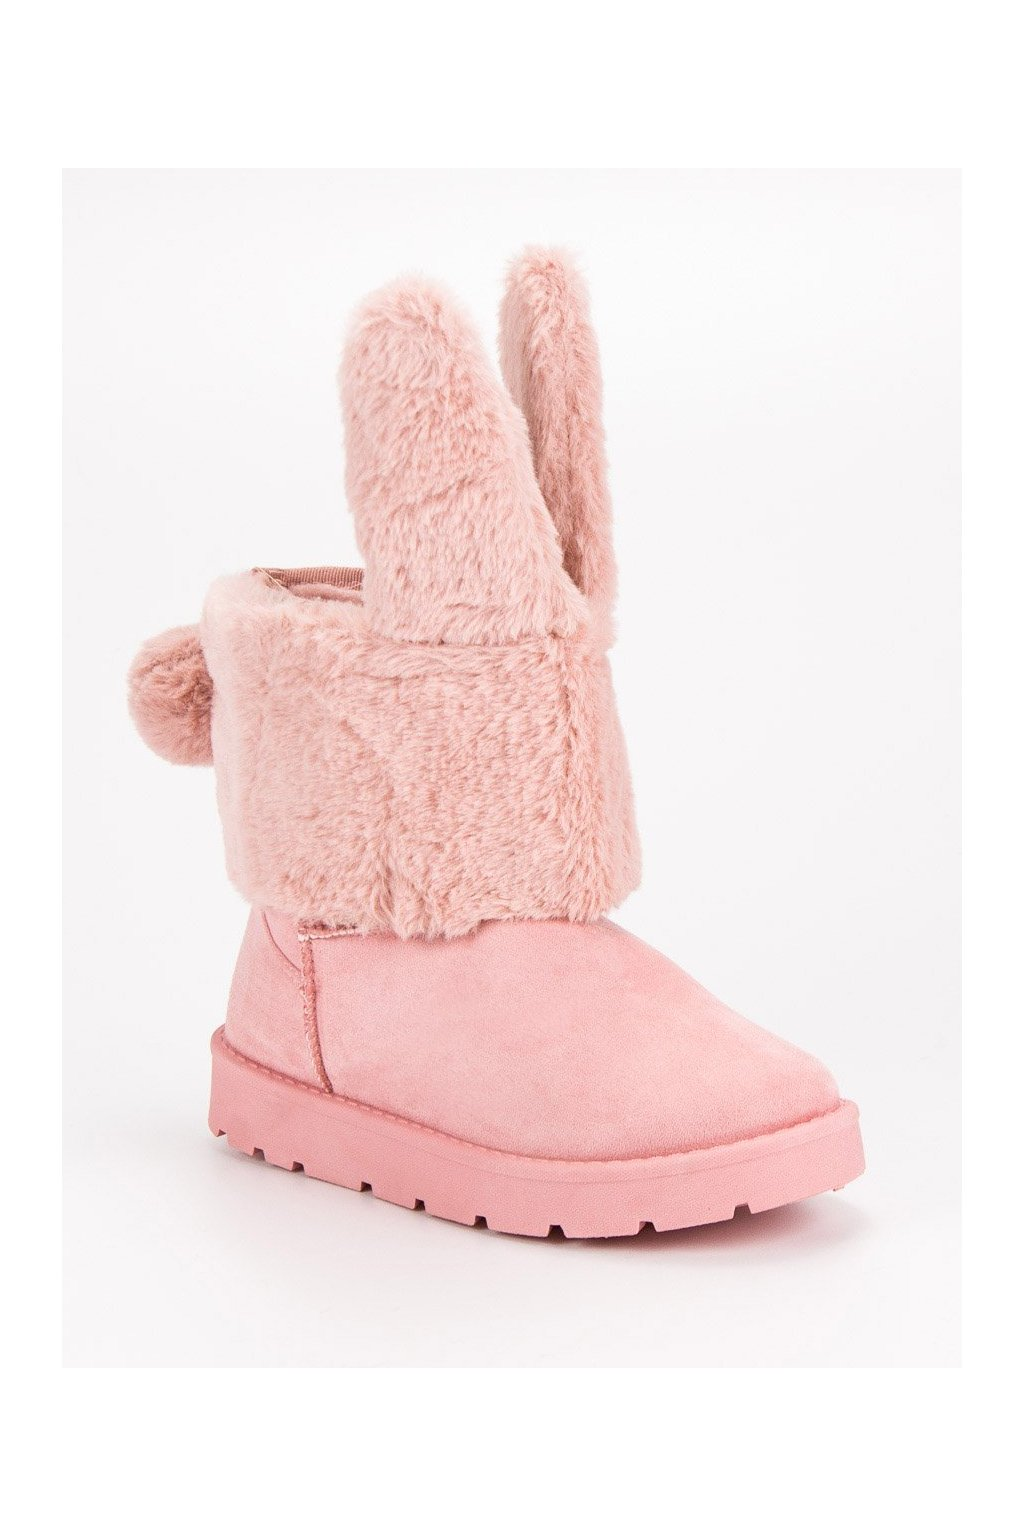 ... Ružové snehule s ušami Seastar ... 1095a2d47c